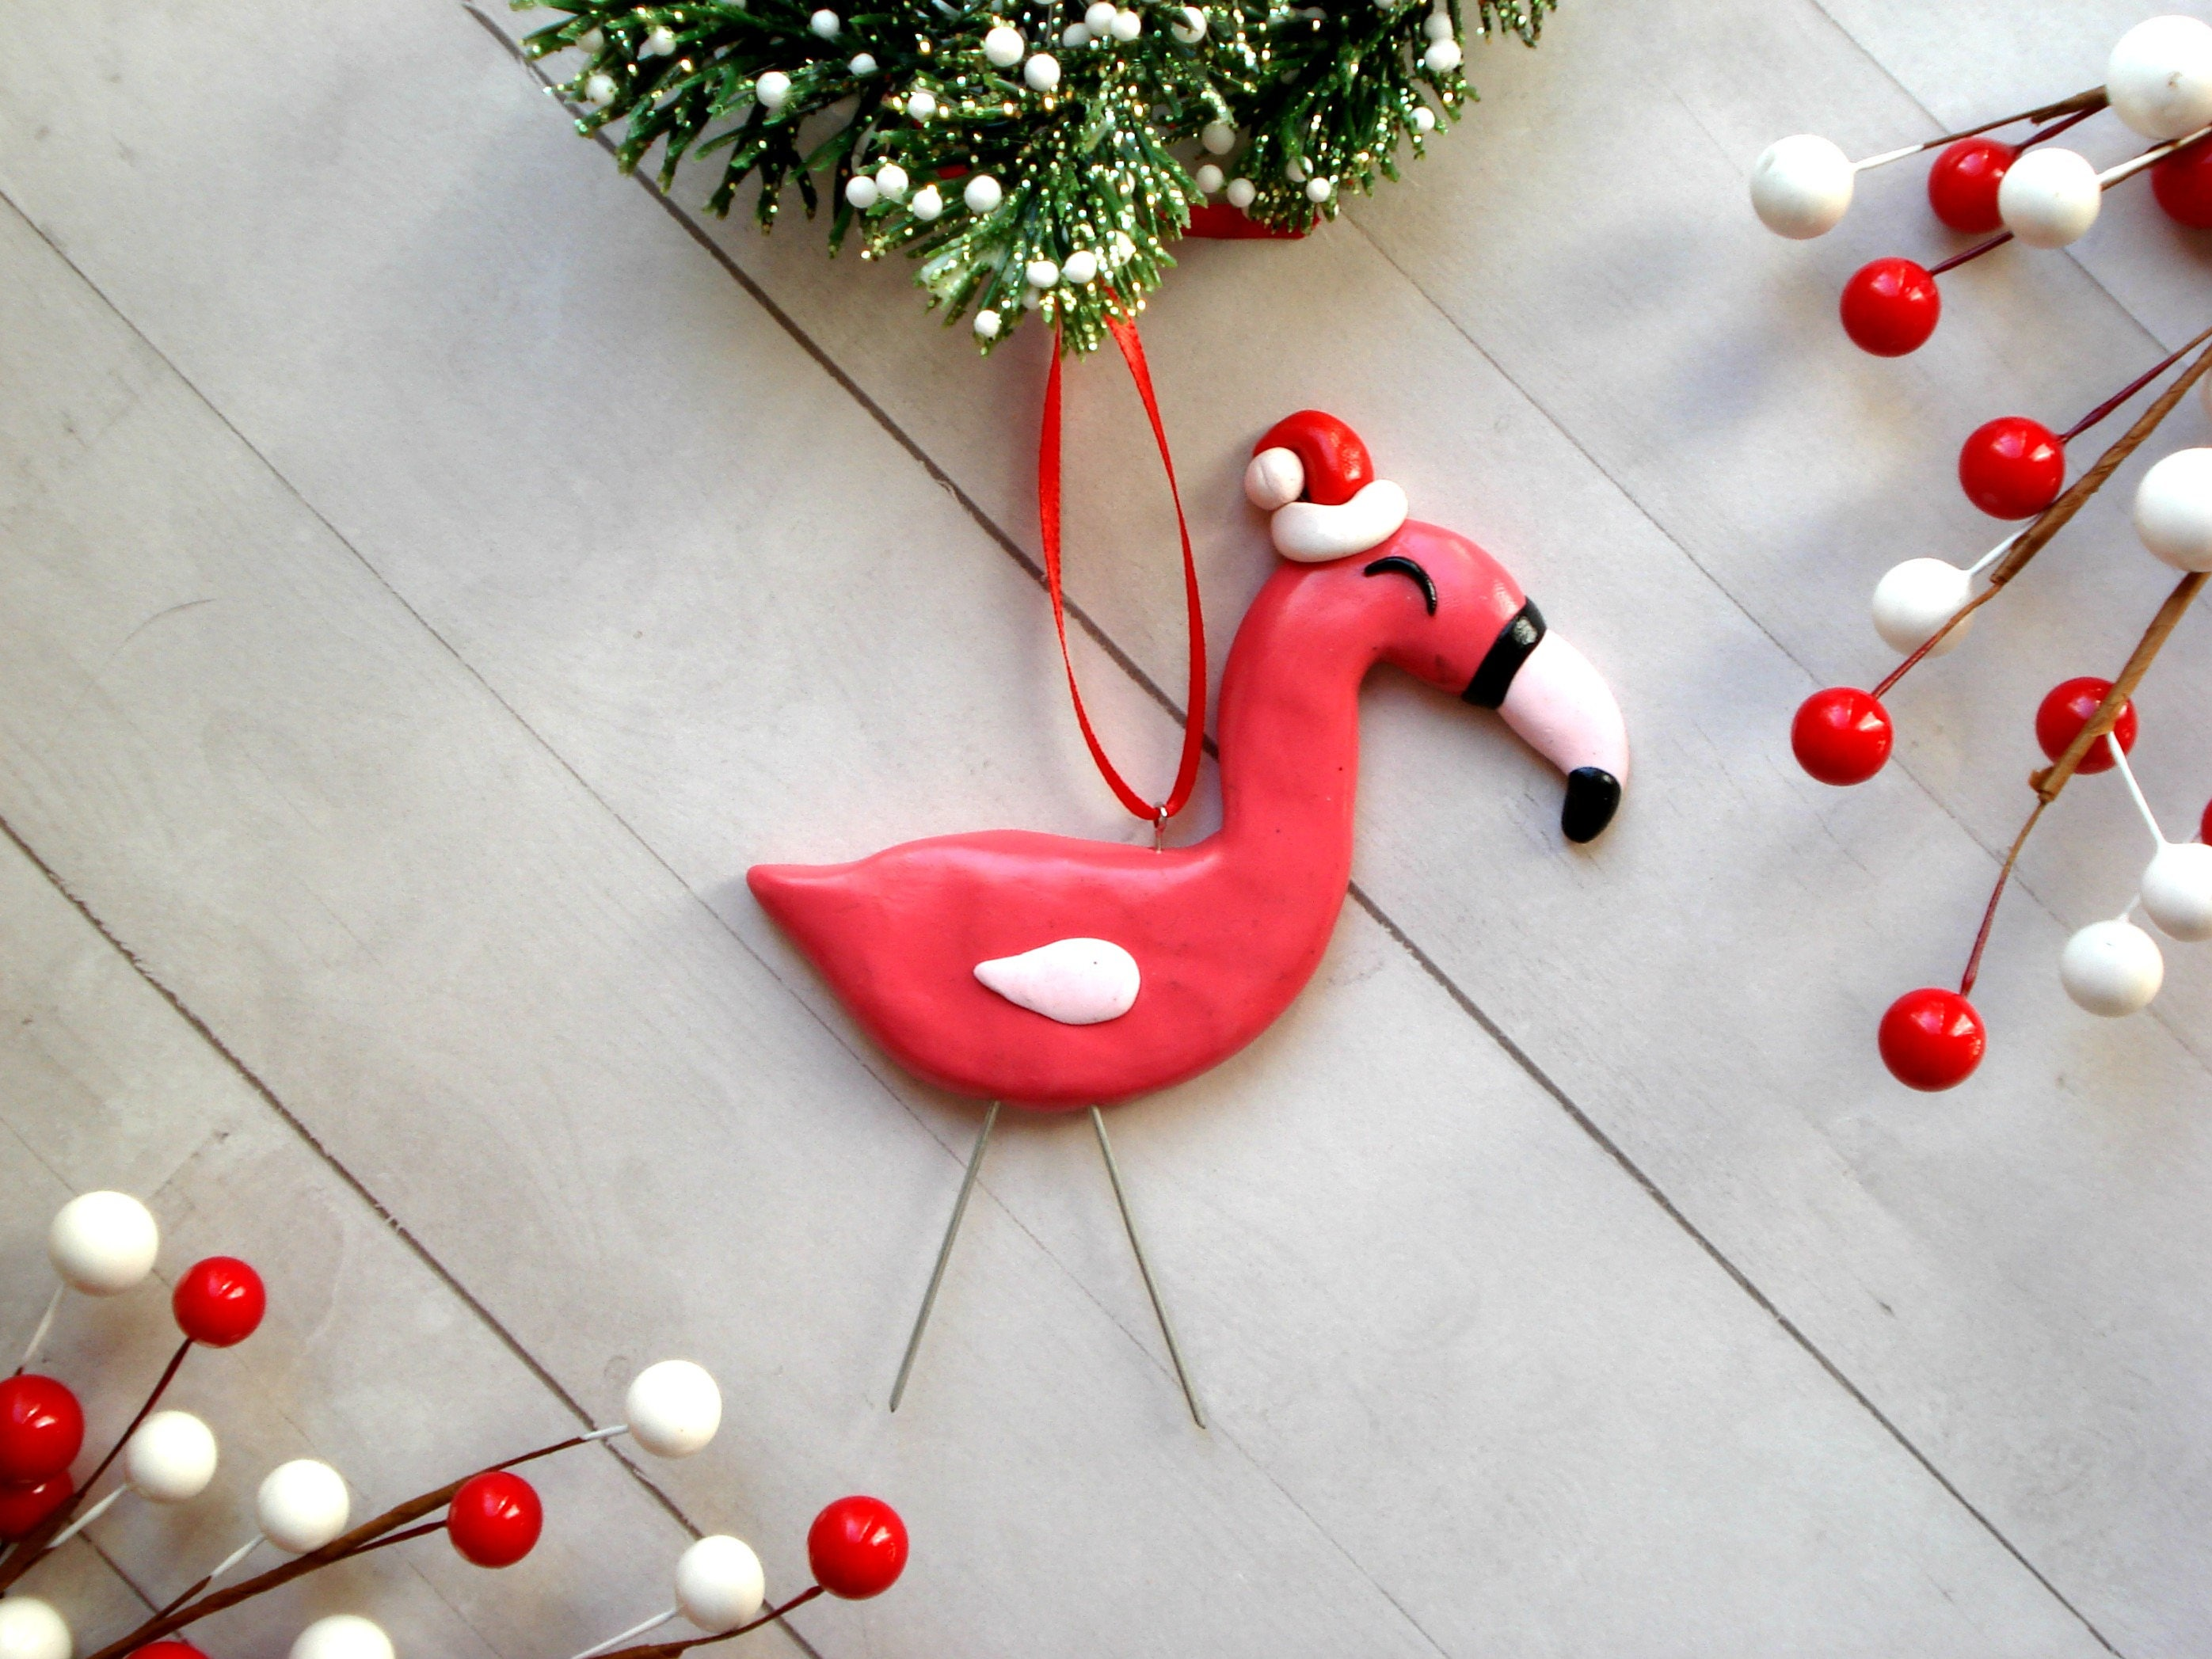 Flamingo Christmas Ornament Flamingo Ornament tropischen | Etsy